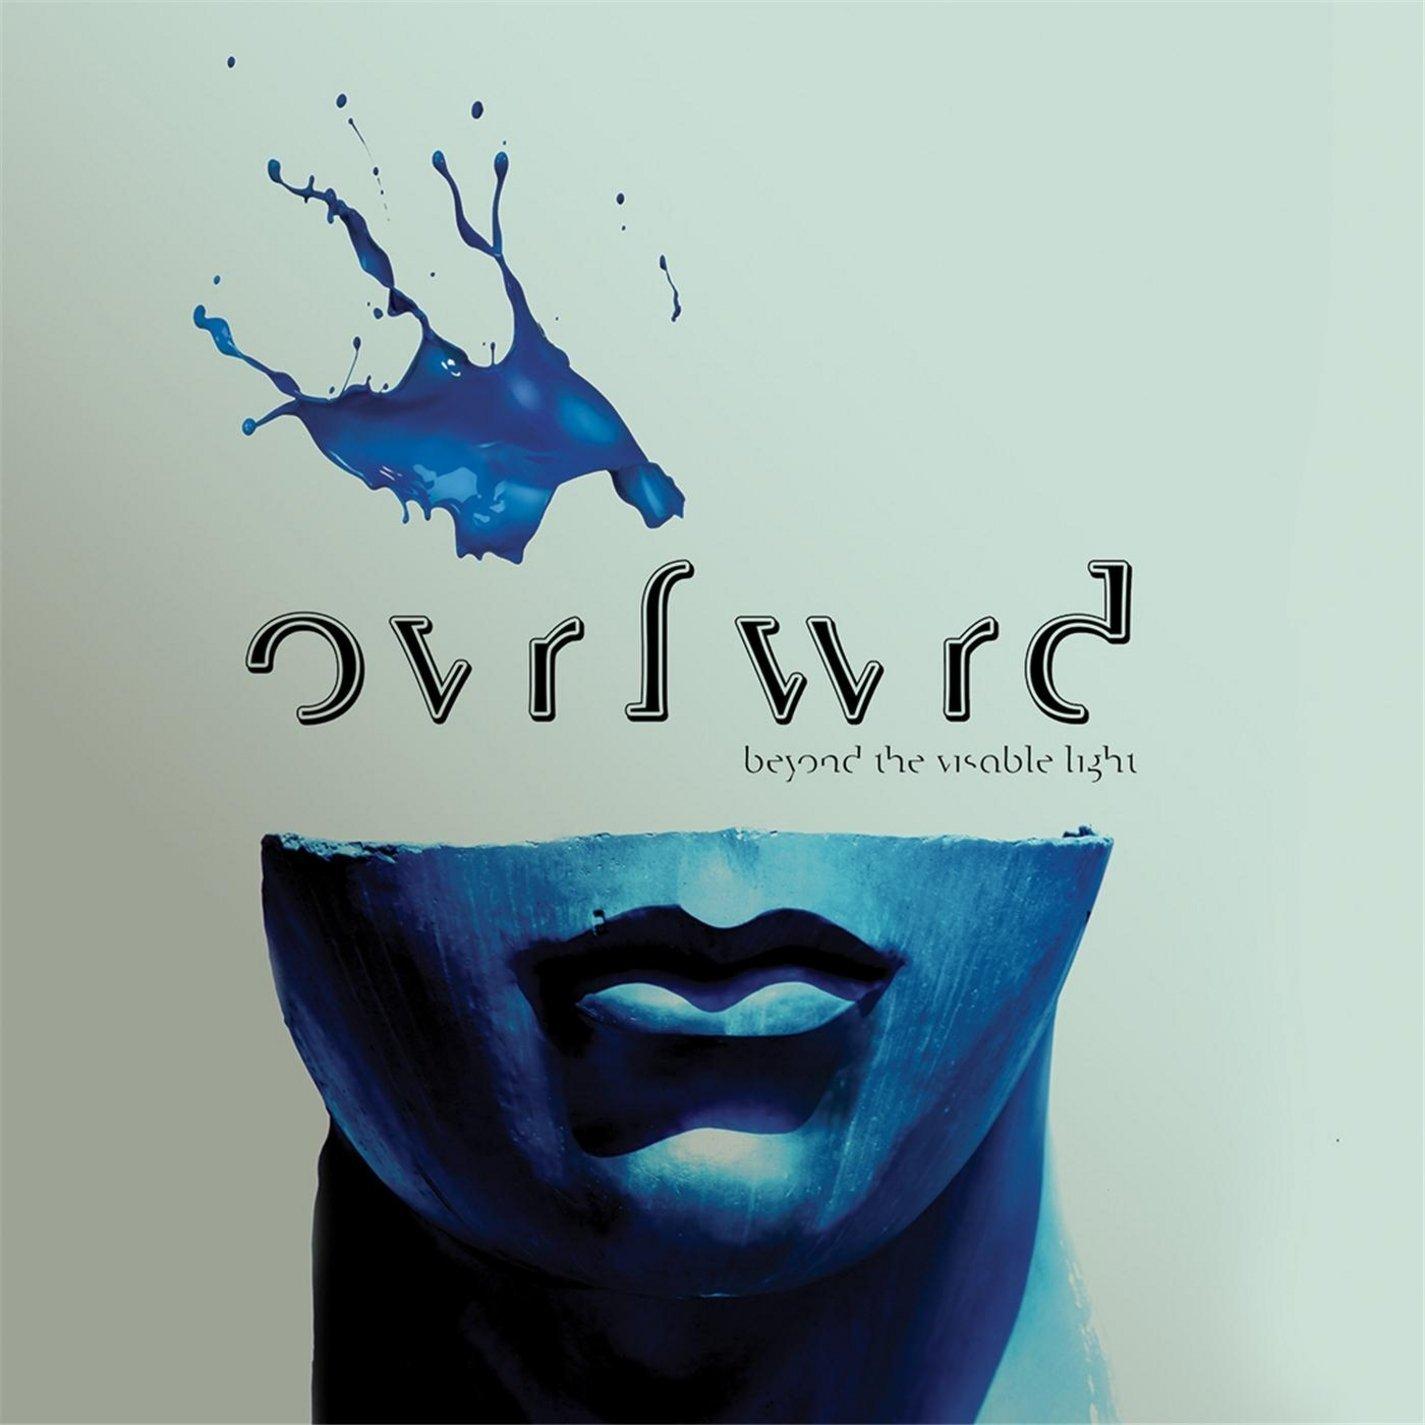 Ovrfwrd - Beyond the visible light [2014]